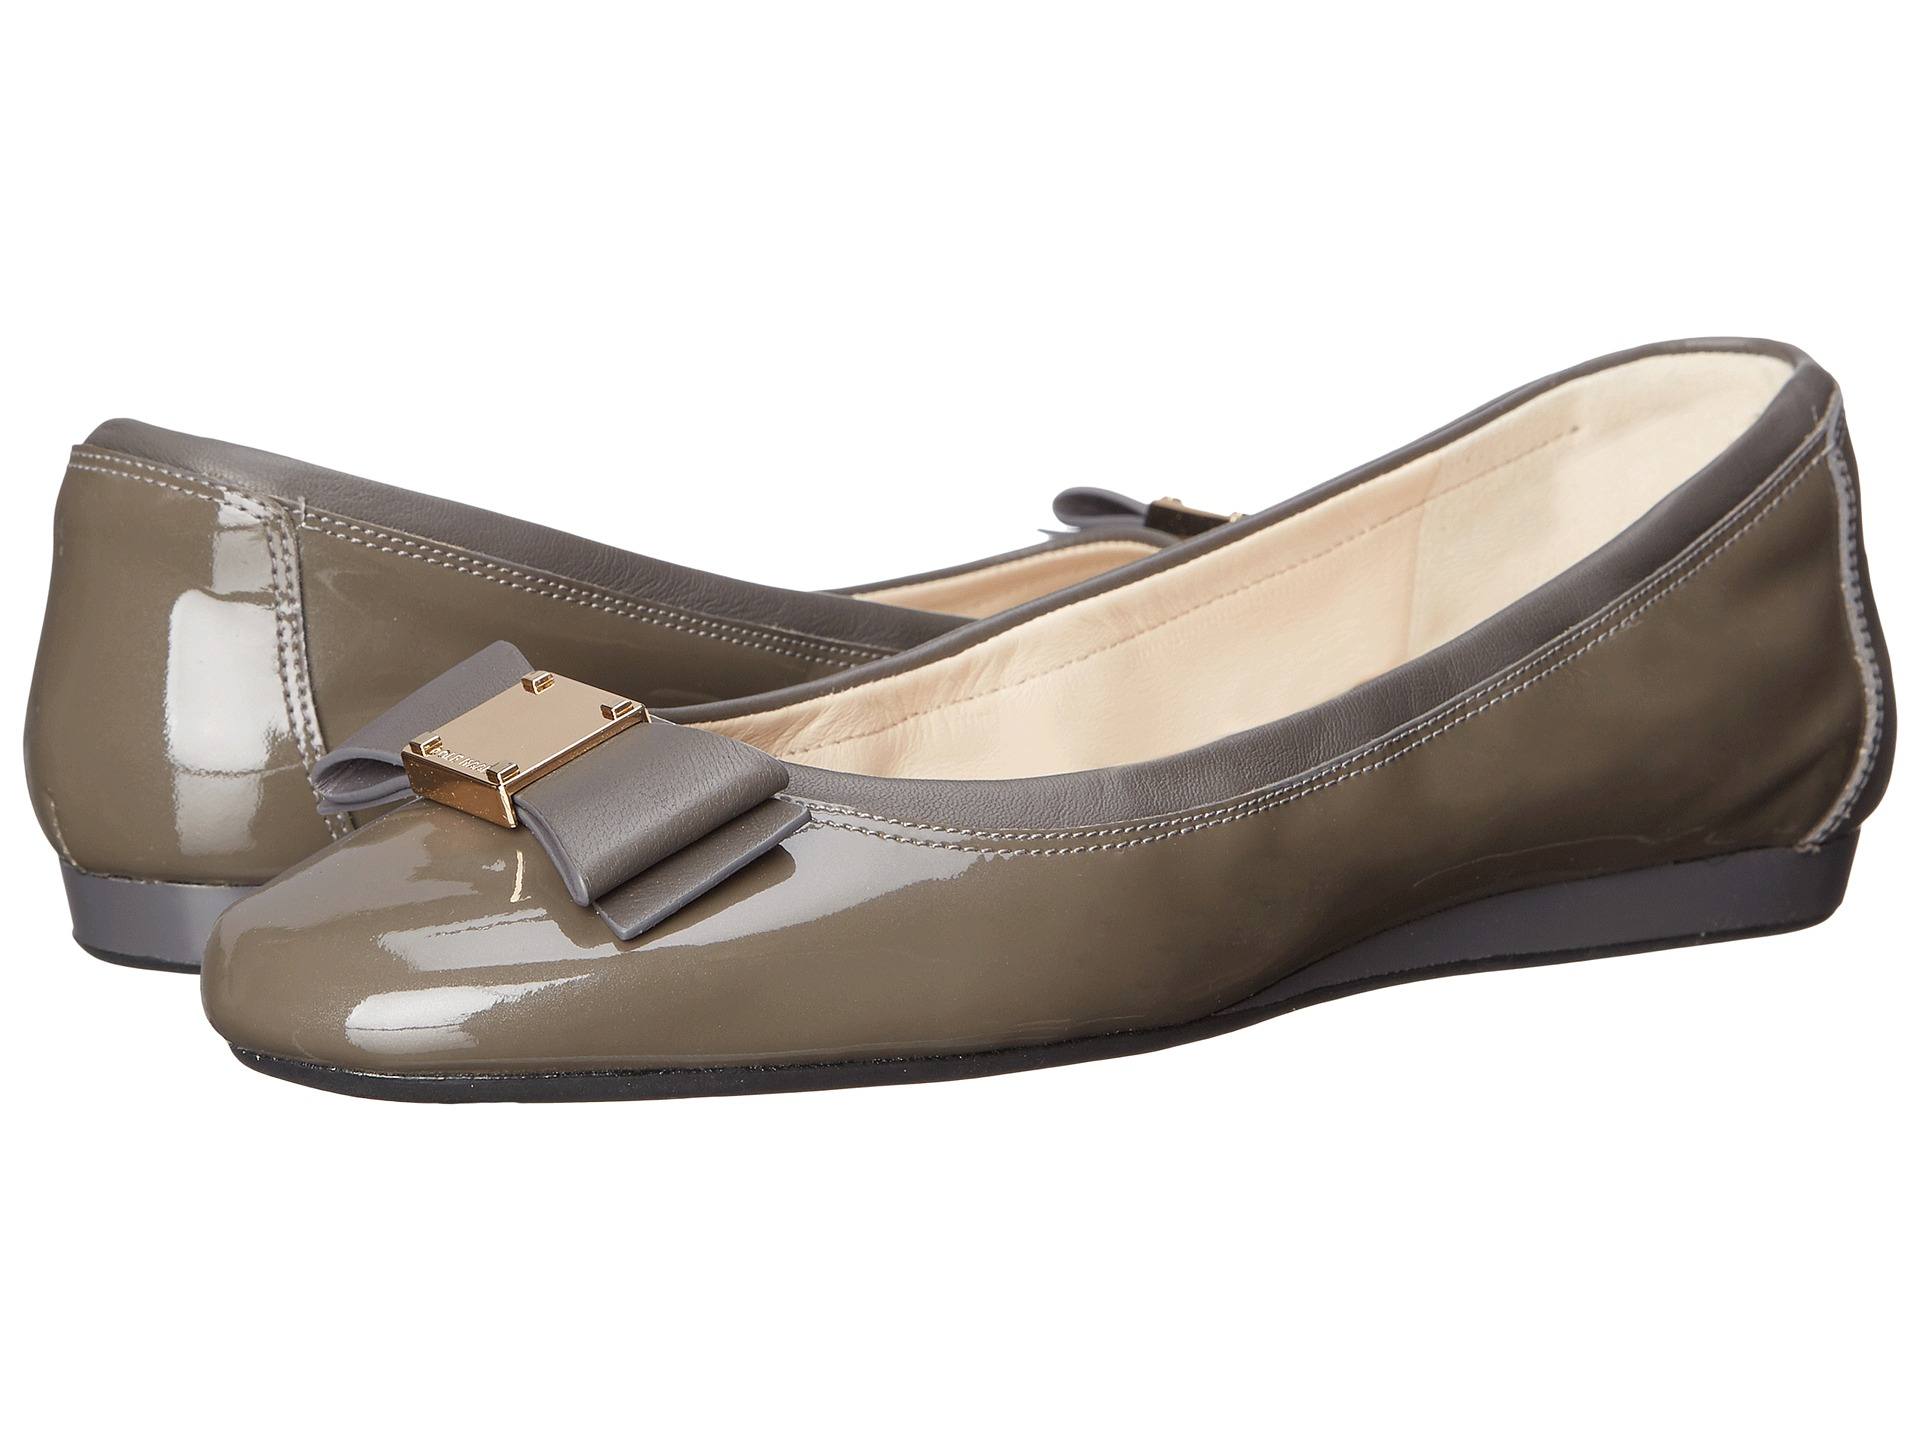 Womens Shoes Cole Haan Tali Bow Ballet Stormcloud Metallic Patent/Stormcloud